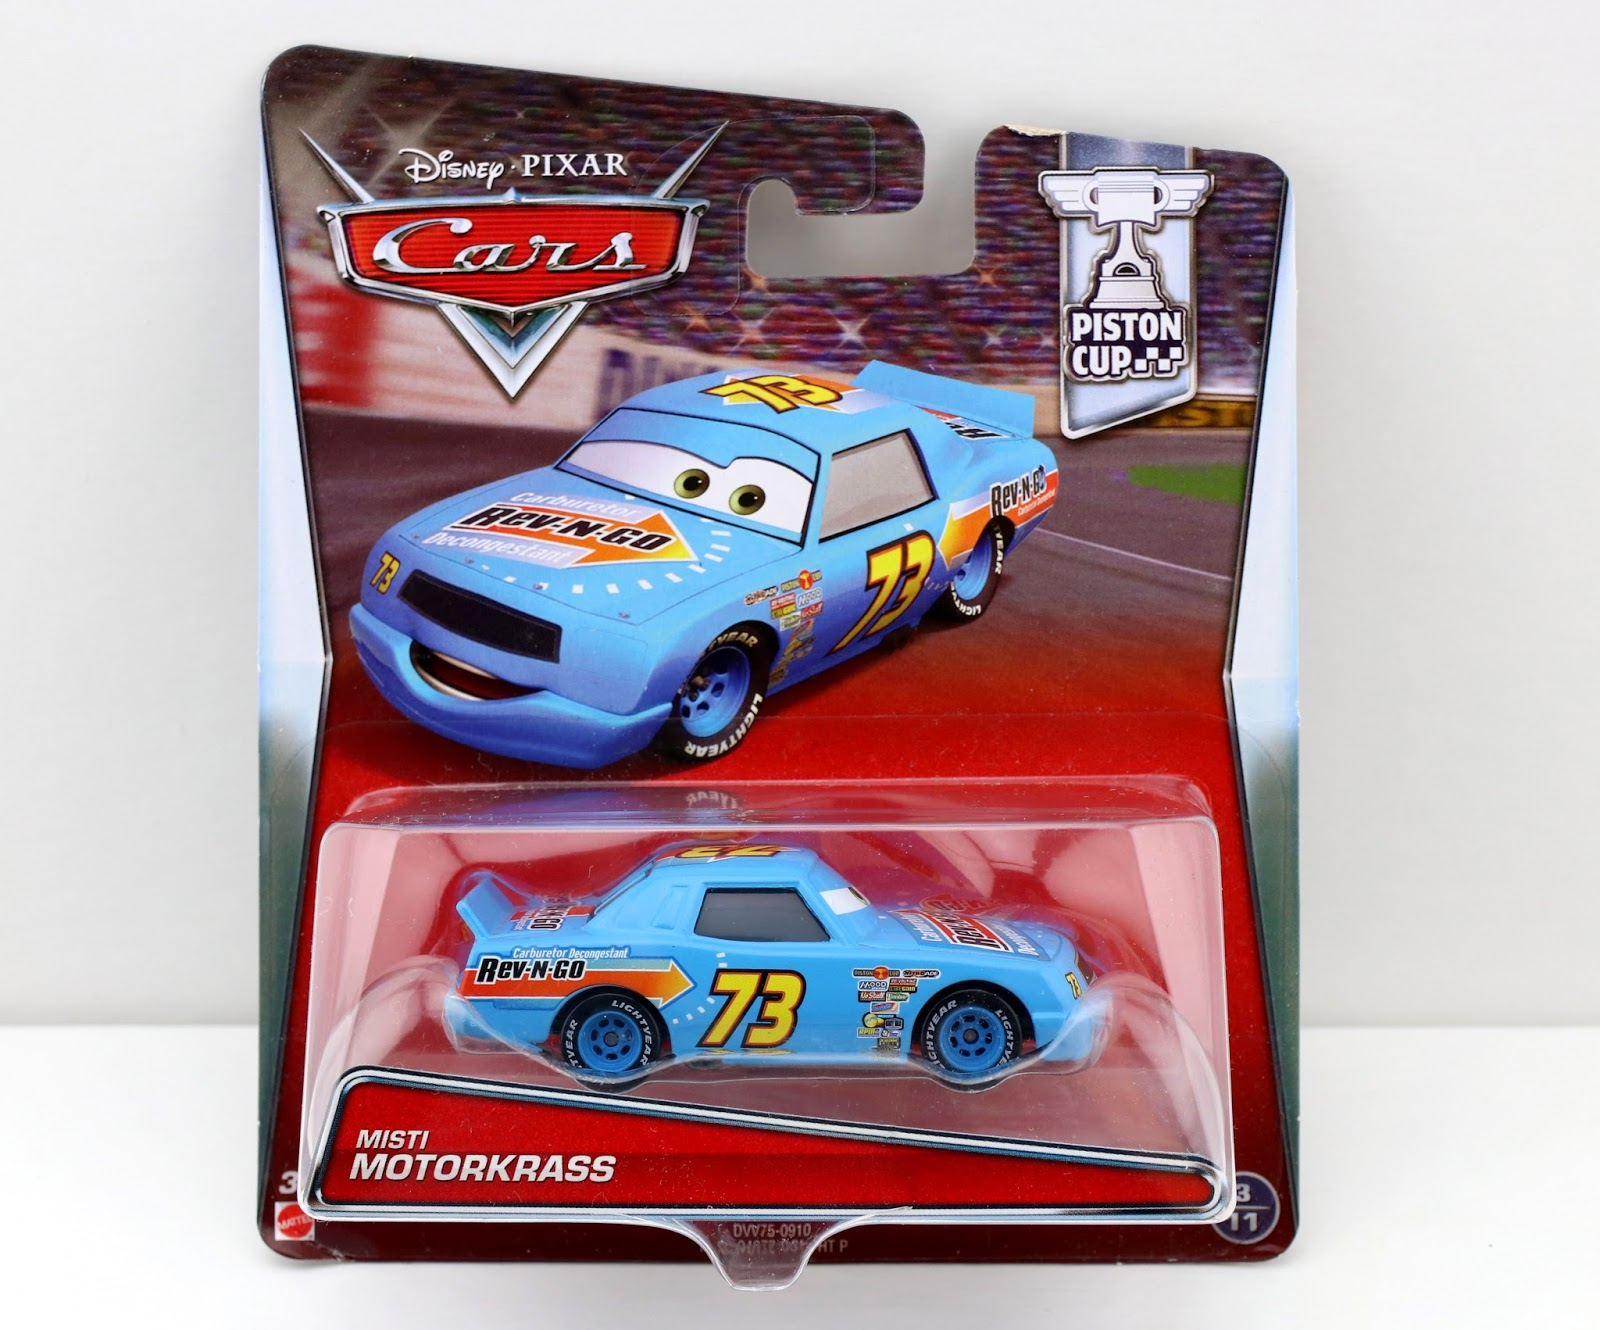 Cars Misti MotorKrass (Rev 'N' Go)